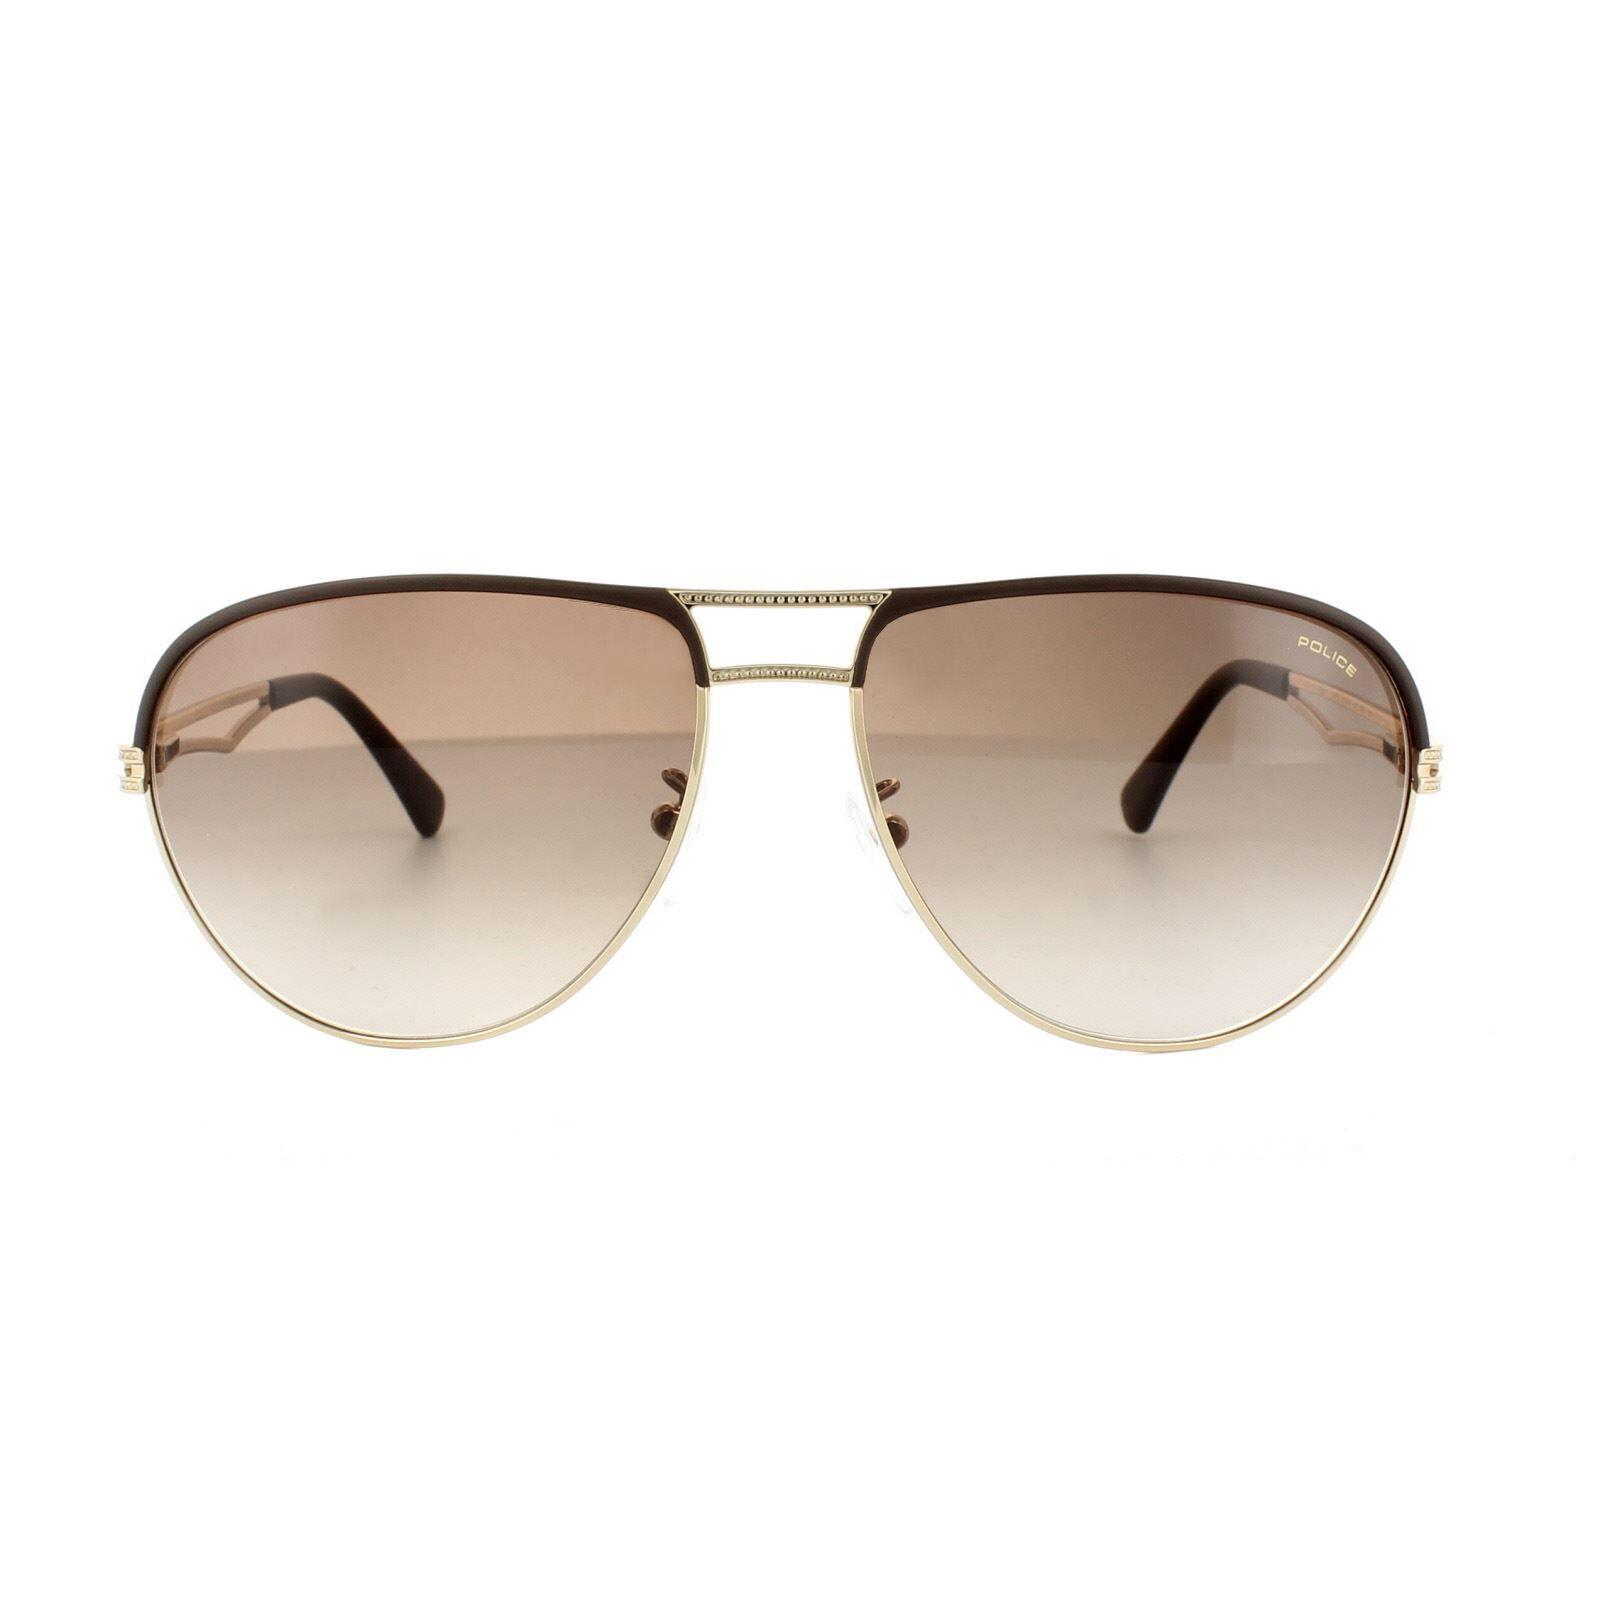 Police Sunglasses S8754 Rush 1 0F93 Rose Gold Brown Gradient